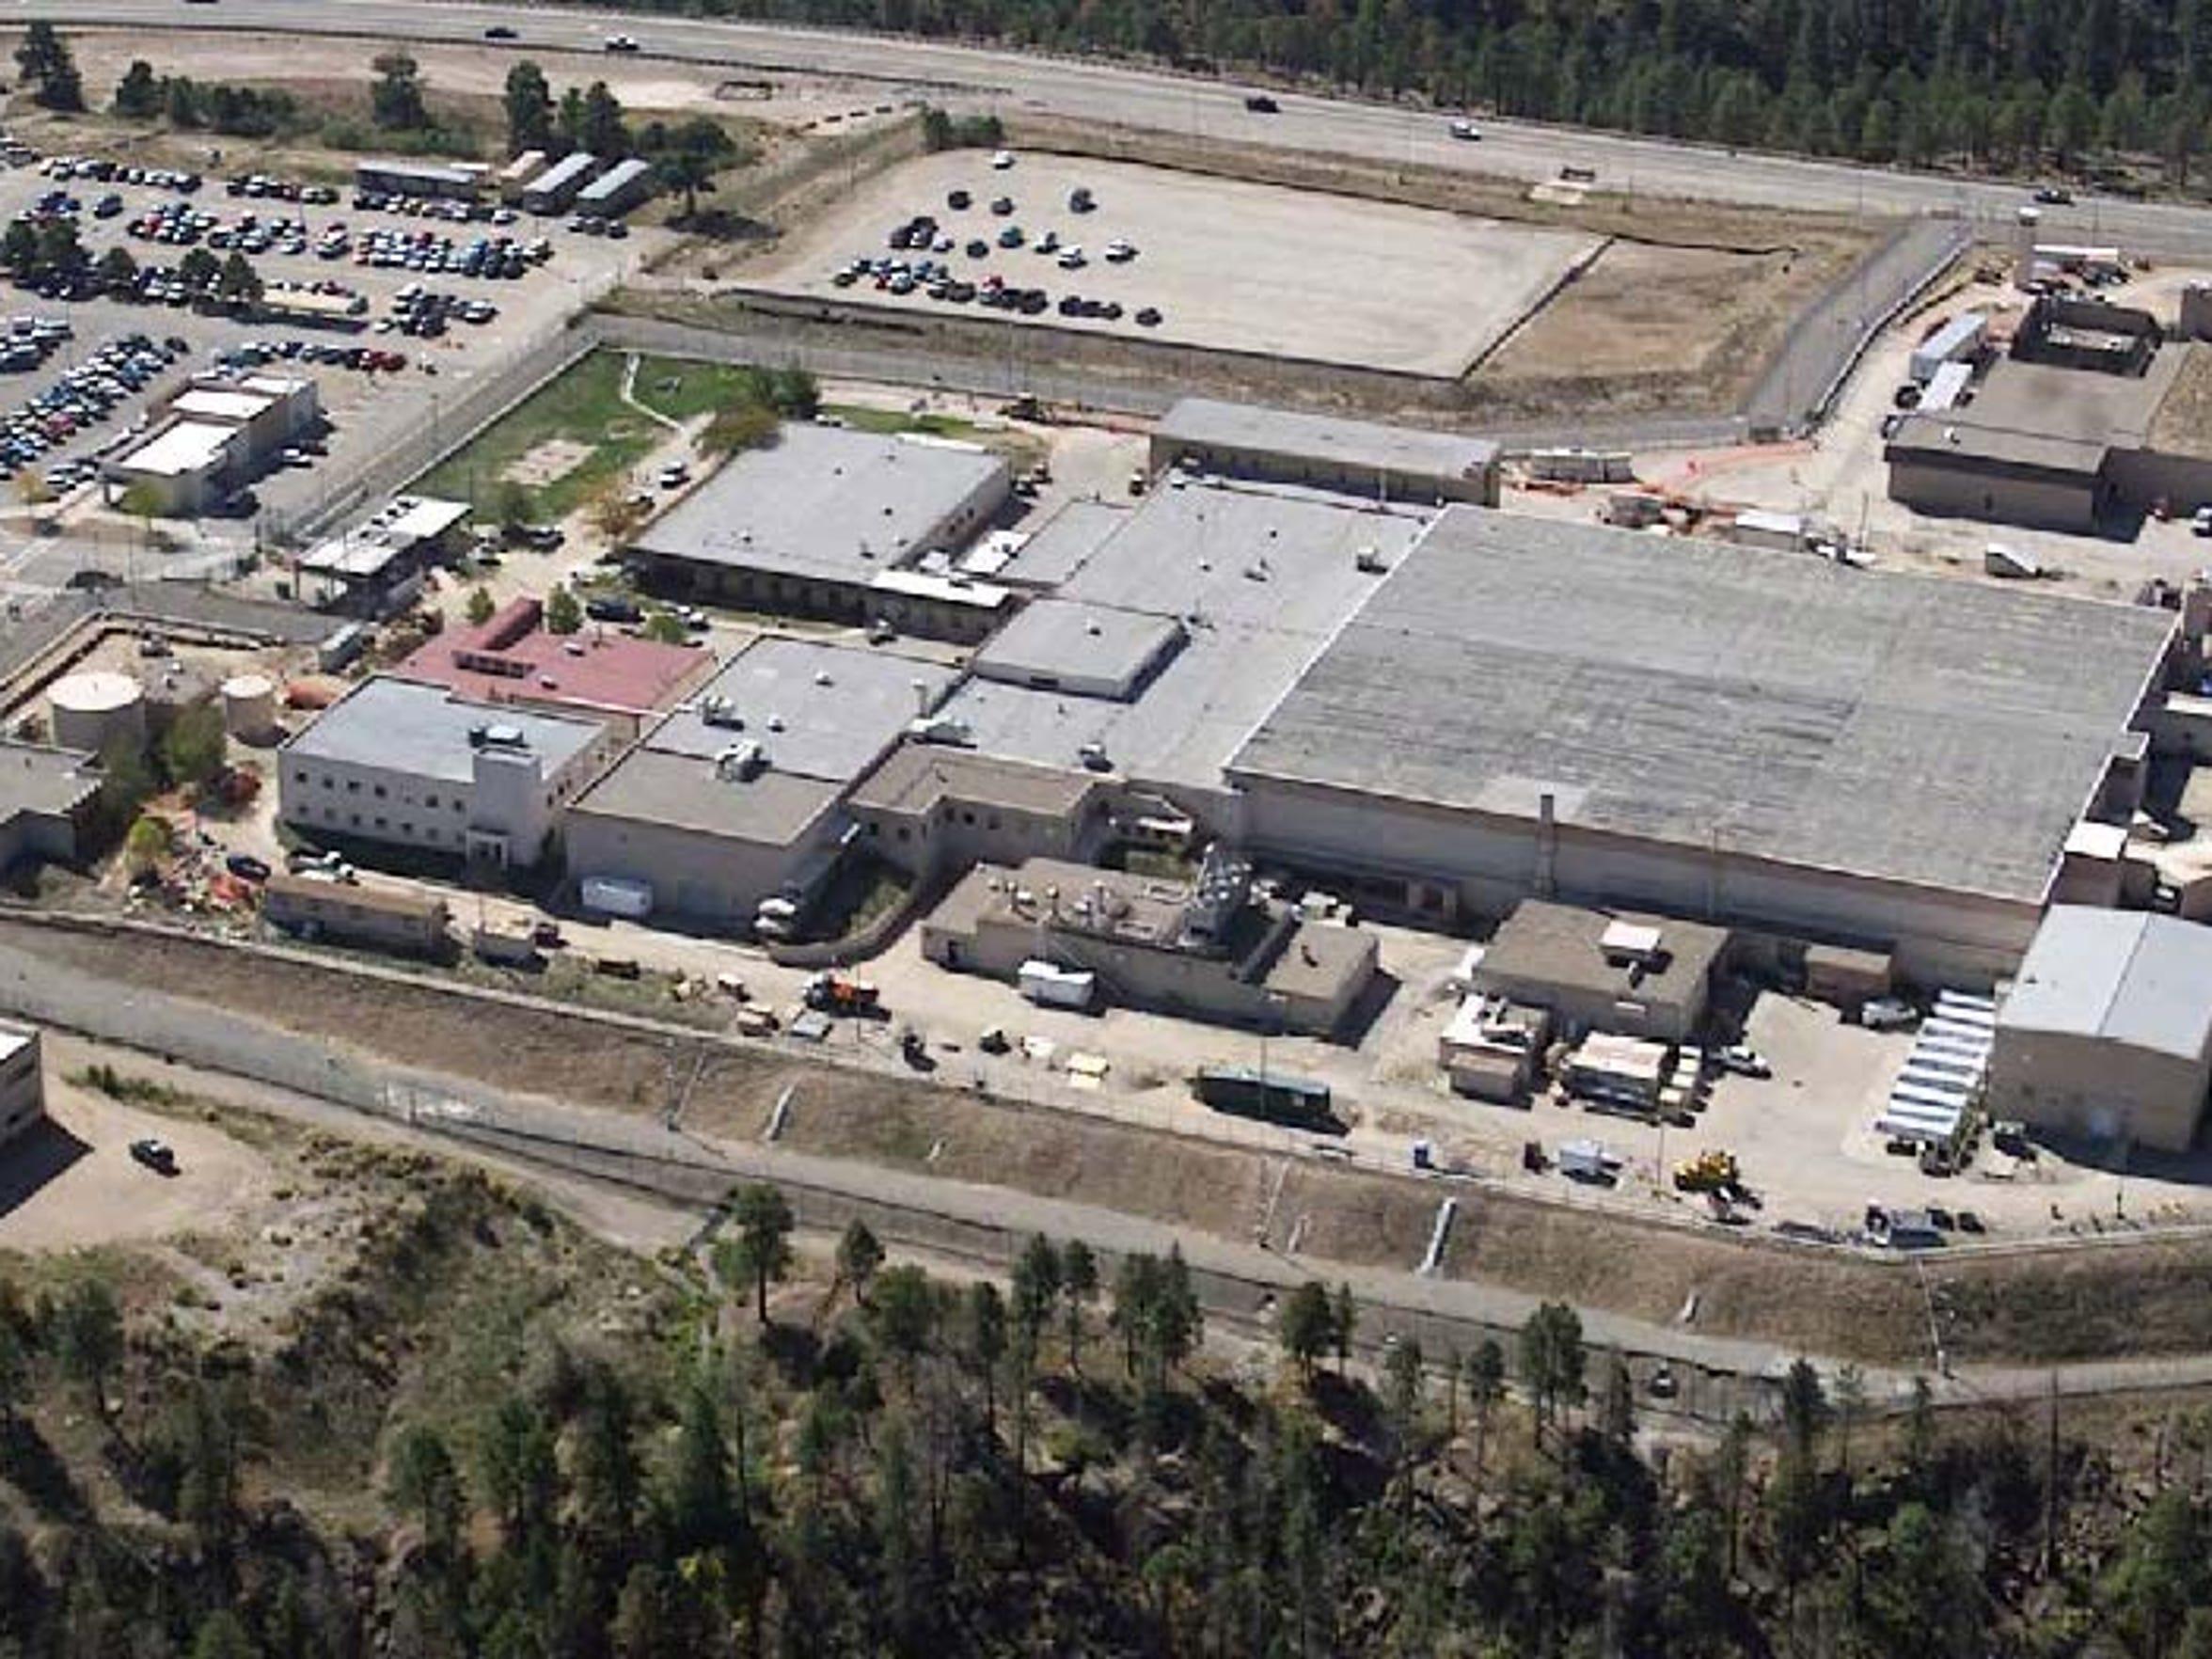 Plutonium Facility-4 at Los Alamos National Laboratory